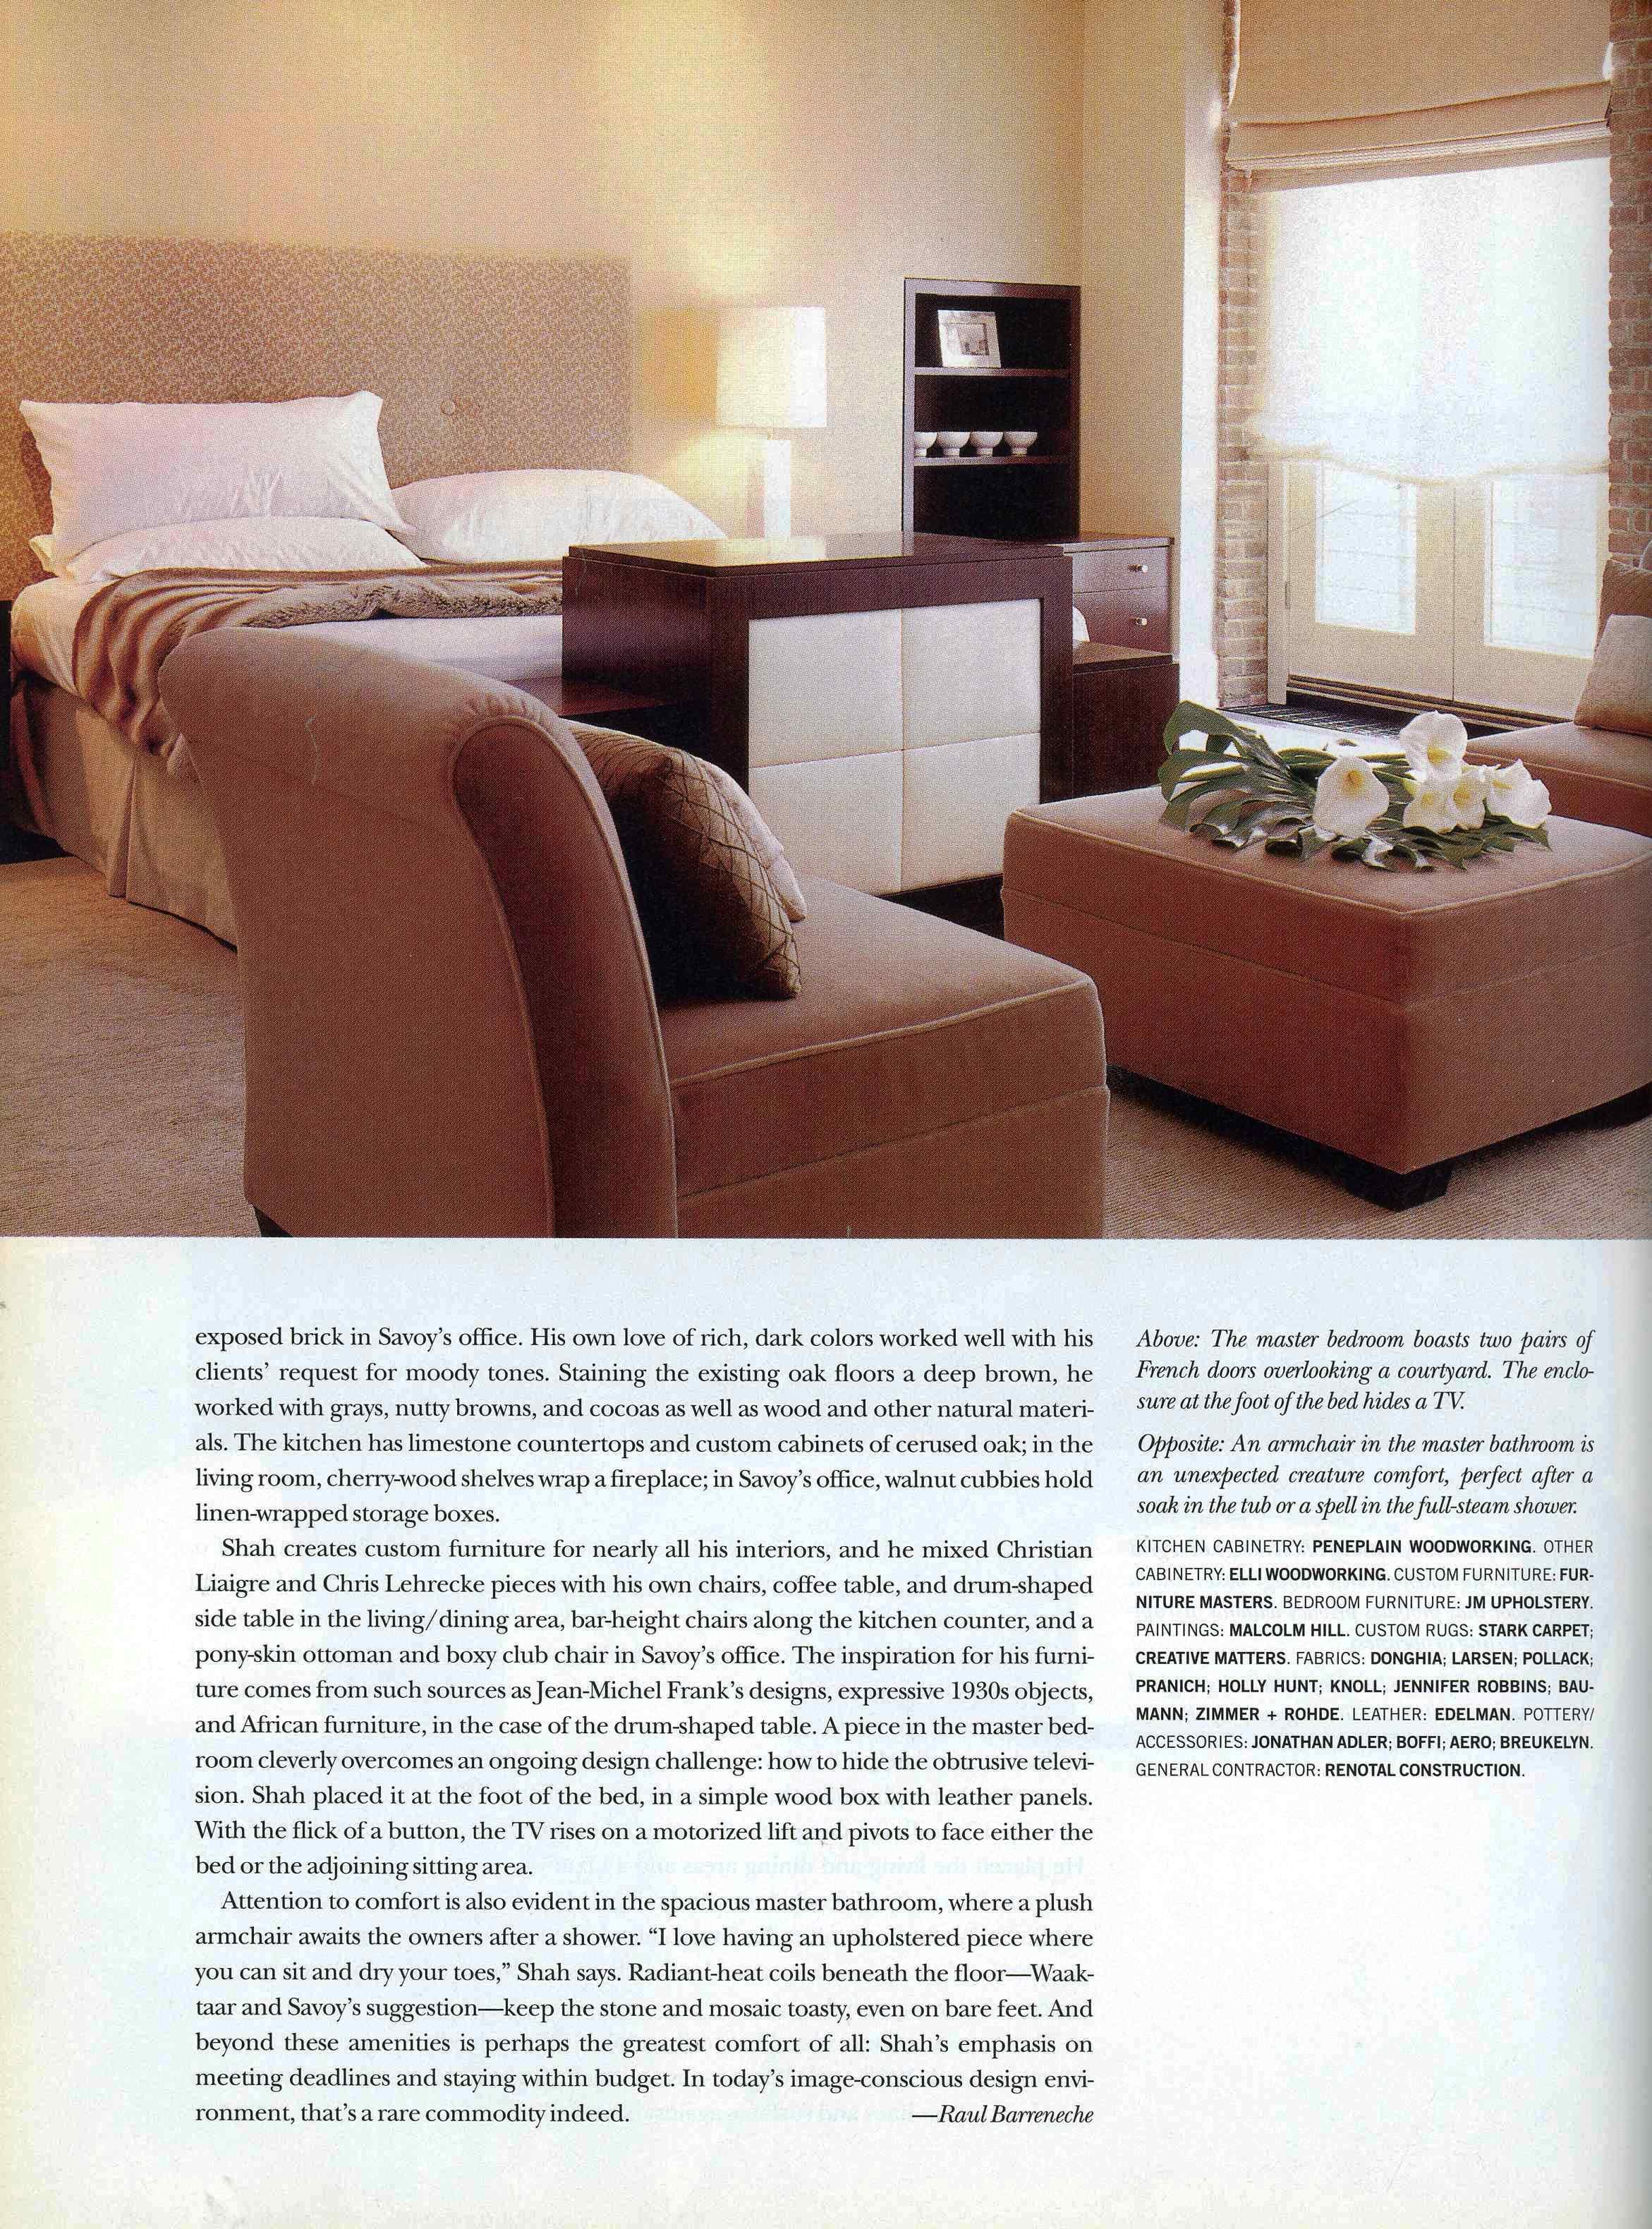 Interior Design_Nov 01_Savoy_Full Article_Page_8.jpg